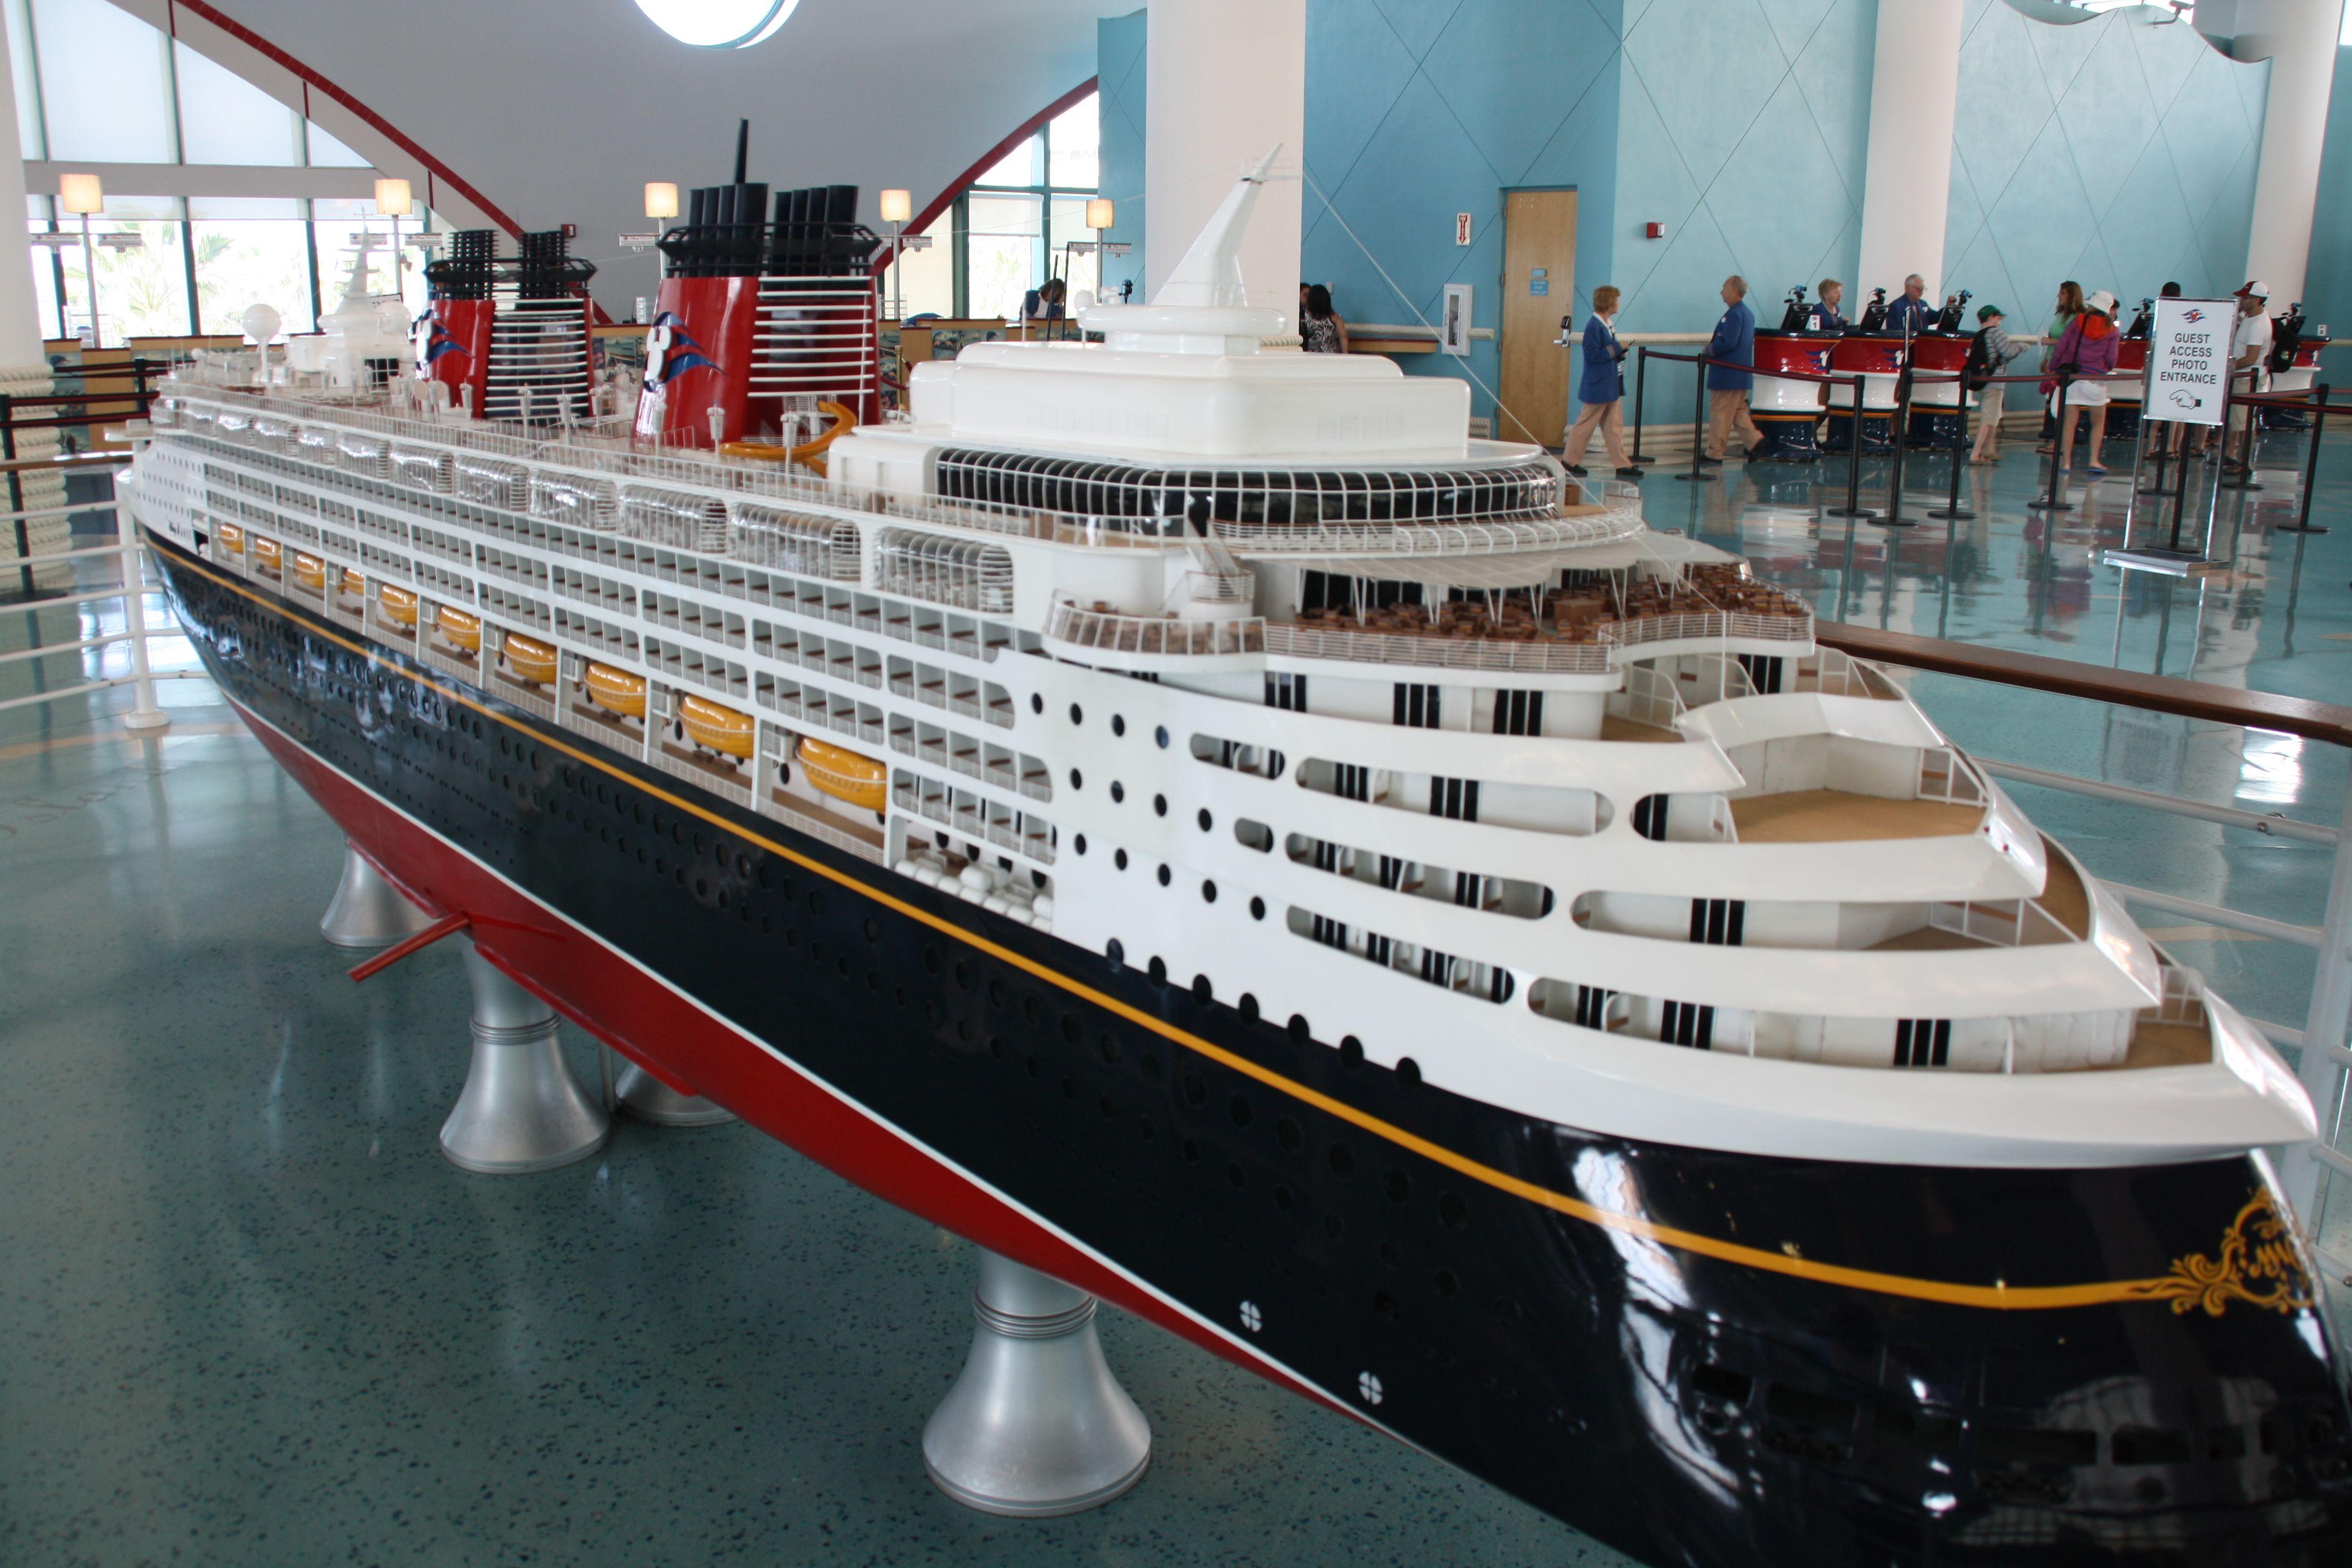 Disney Cruise Line trip report – Day 1